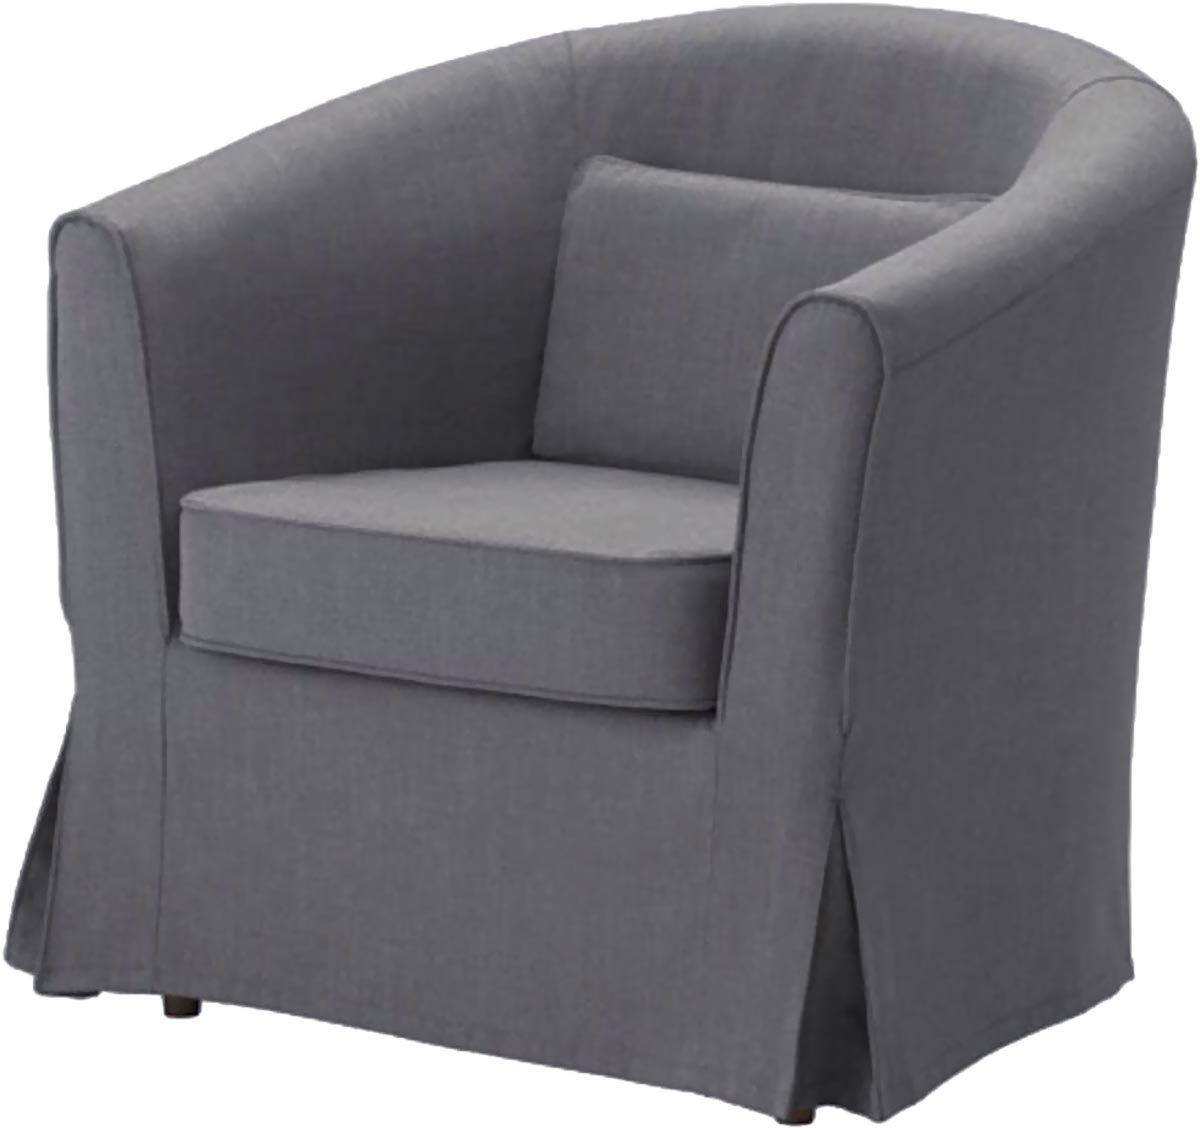 Easy Fit Der Ektorp Tullsta Stuhl-Abdeckung Ersatz ist nach Maß für IKEA Tullsta Cover, A Sessel Sofa Slipcover Replacement Dunkelgrau Cotton